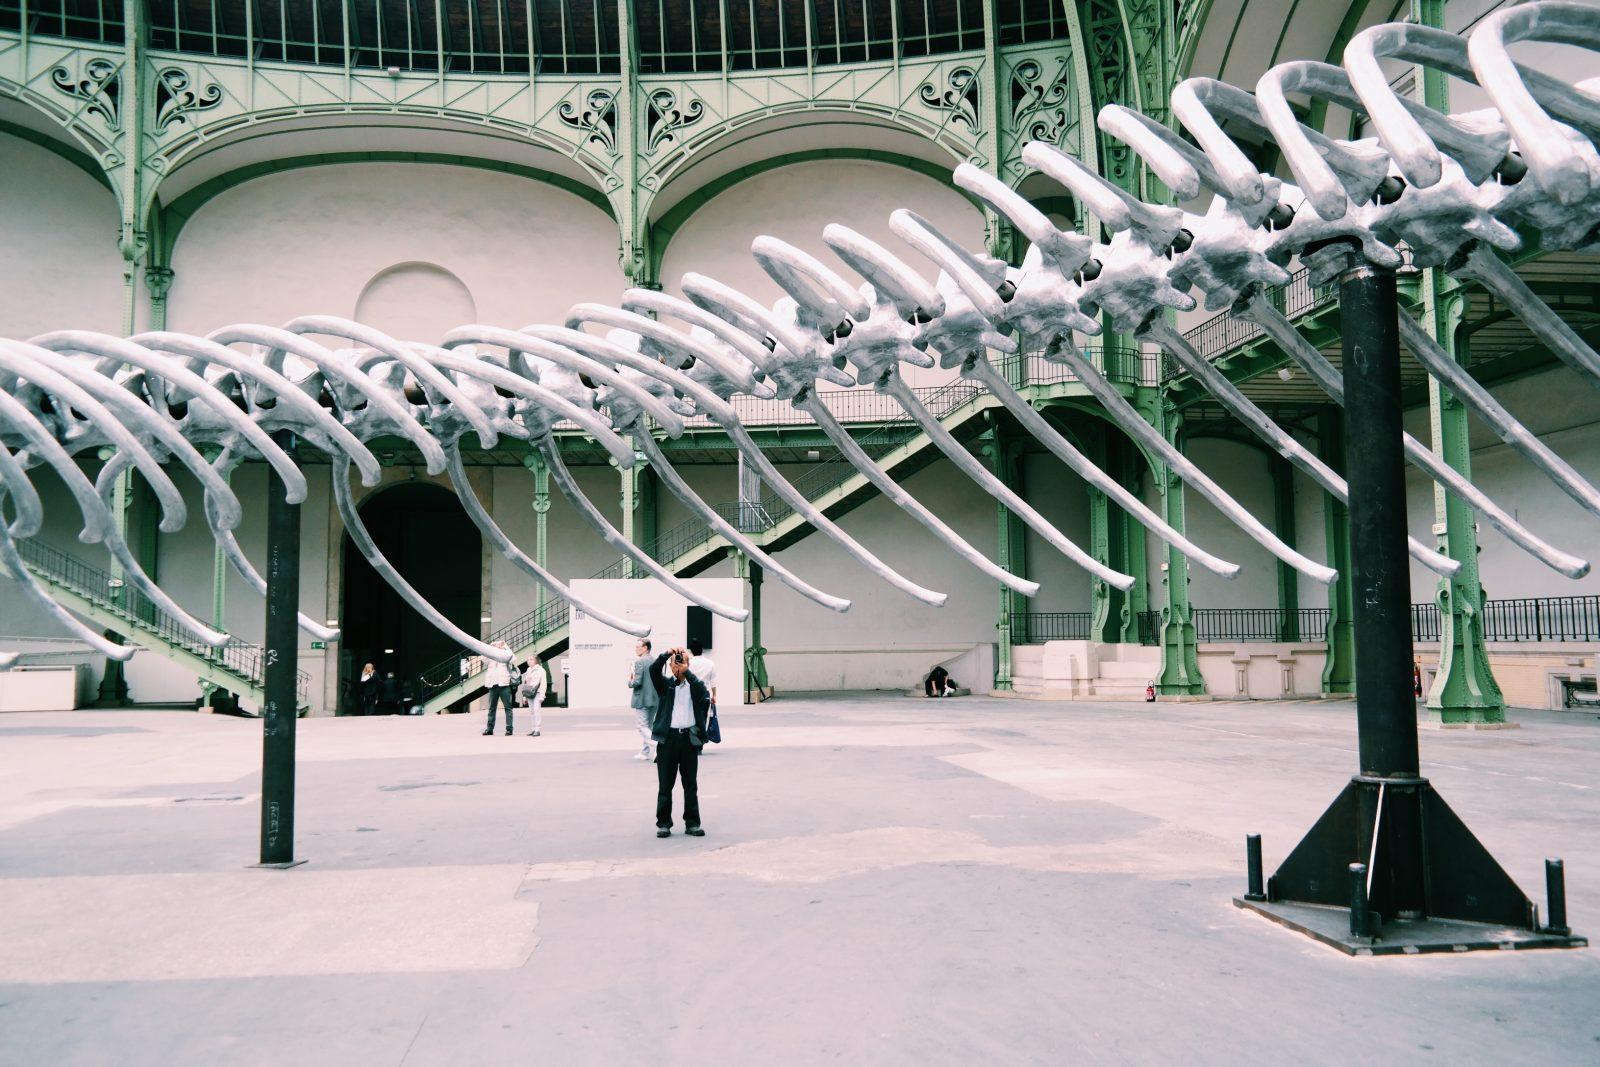 Monumenta-2016-Empires-Huang-Yong-Ping-Grand-Palais-Paris-Nef-photographe-du-squelette-serpent-Kamel-Mennour-photo-usofparis-blog